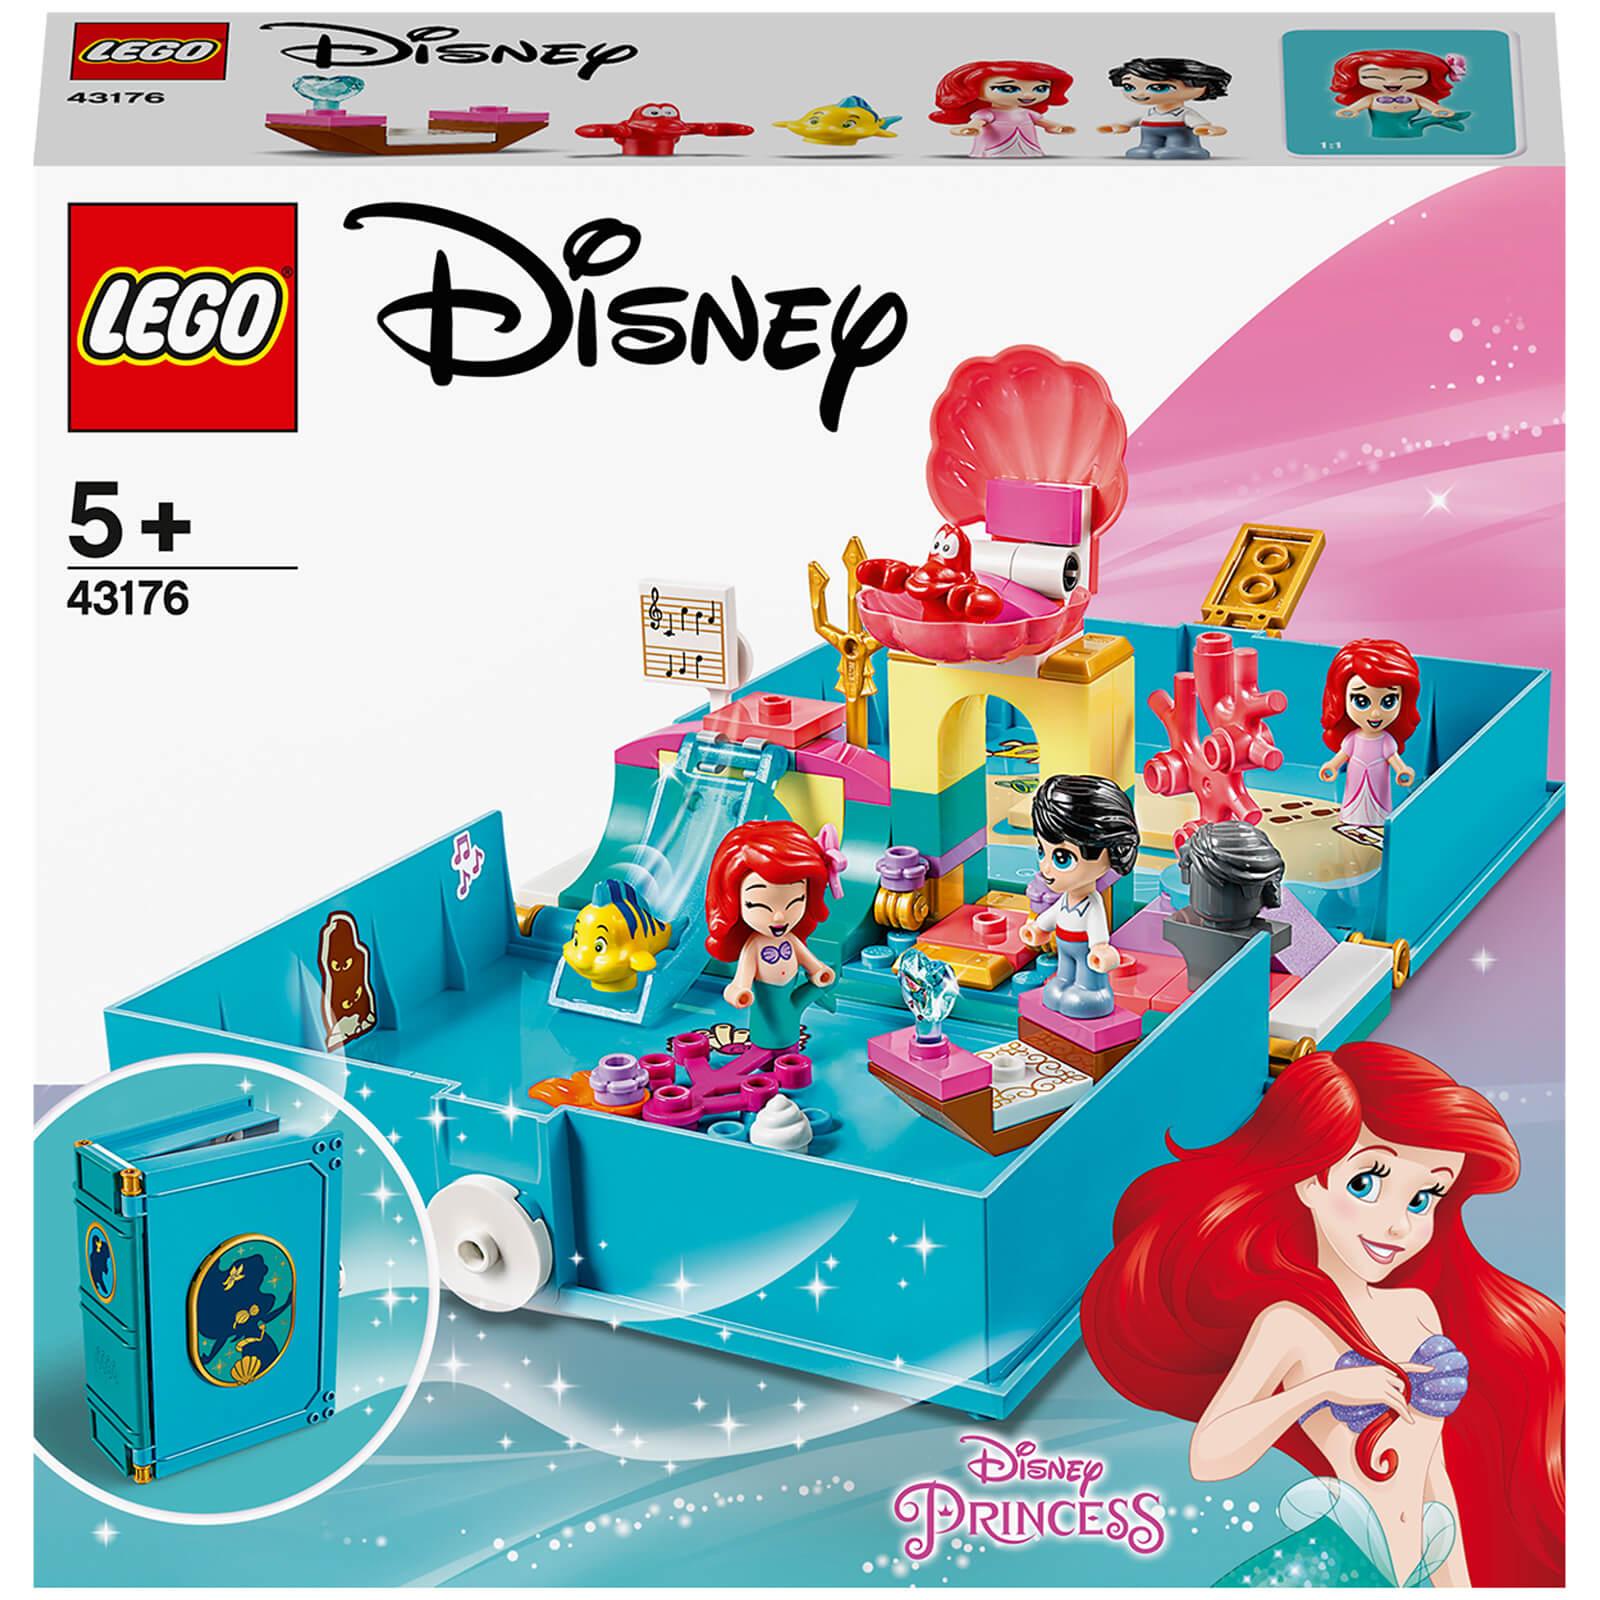 lego disney princess: ariel's storybook adventures set (43176)